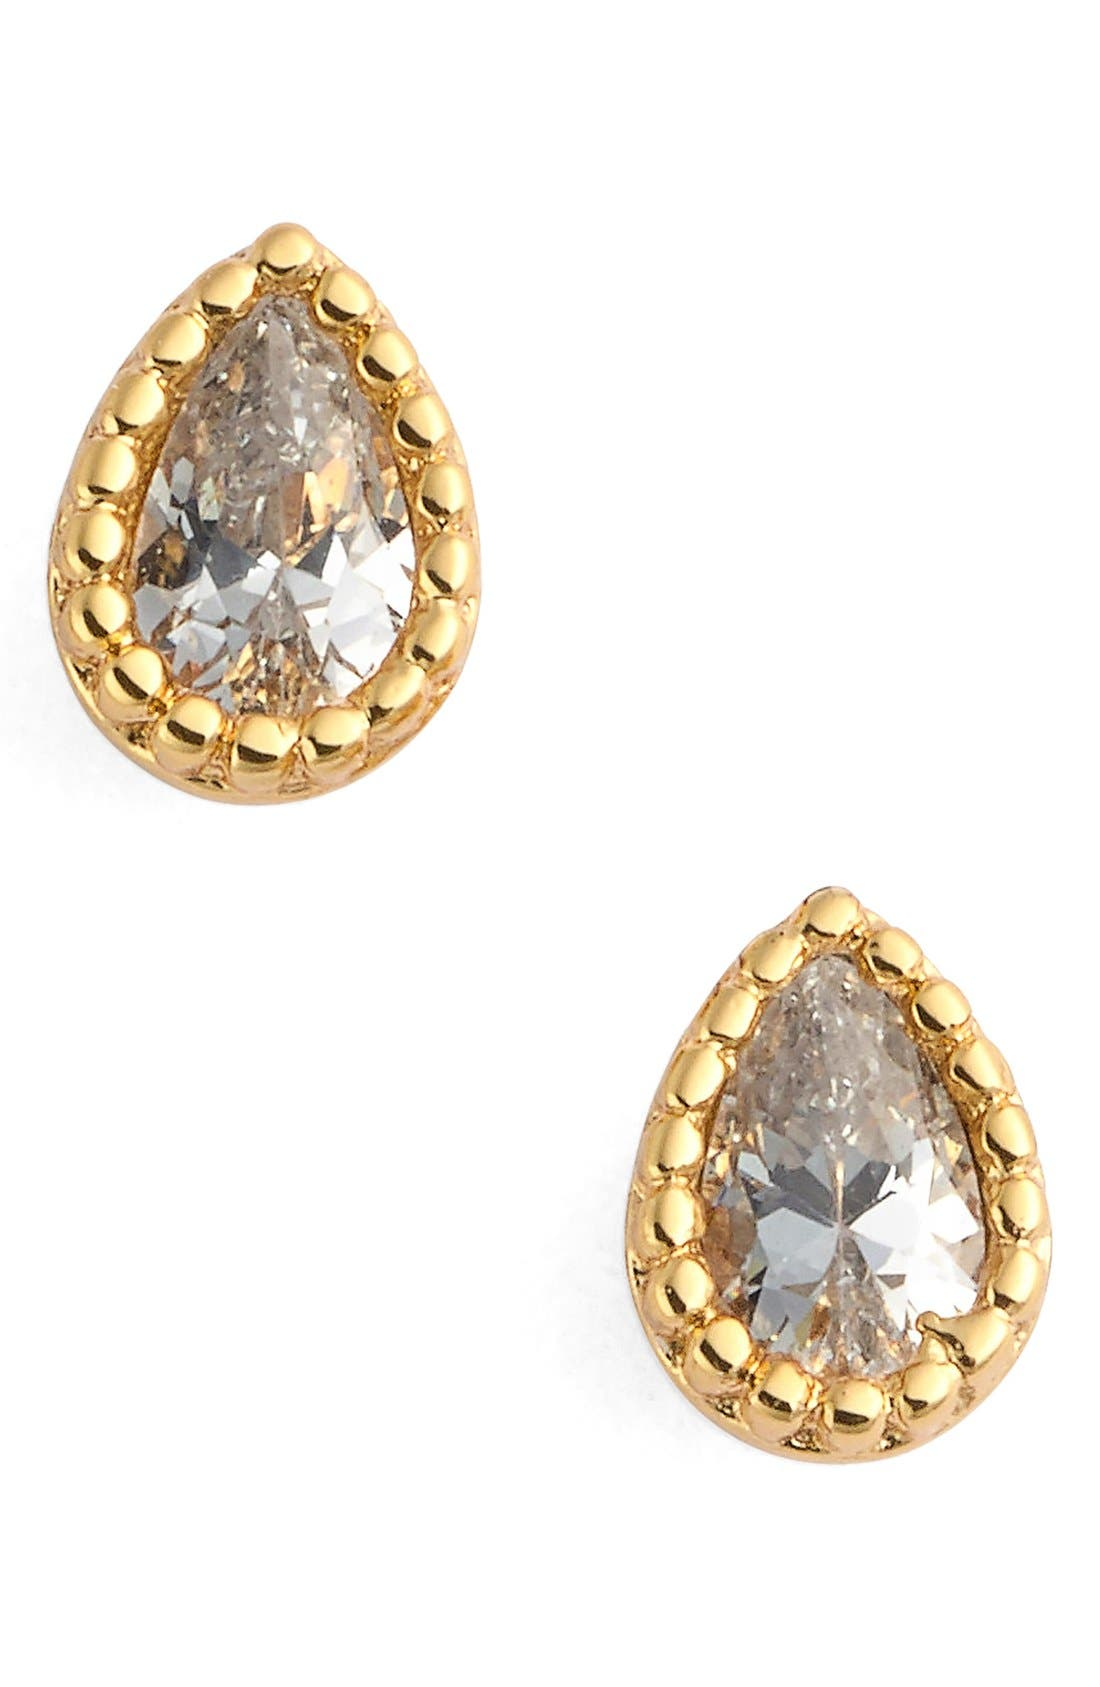 Micro Teardrop Stud Earrings,                         Main,                         color, Yellow Gold/ Clear